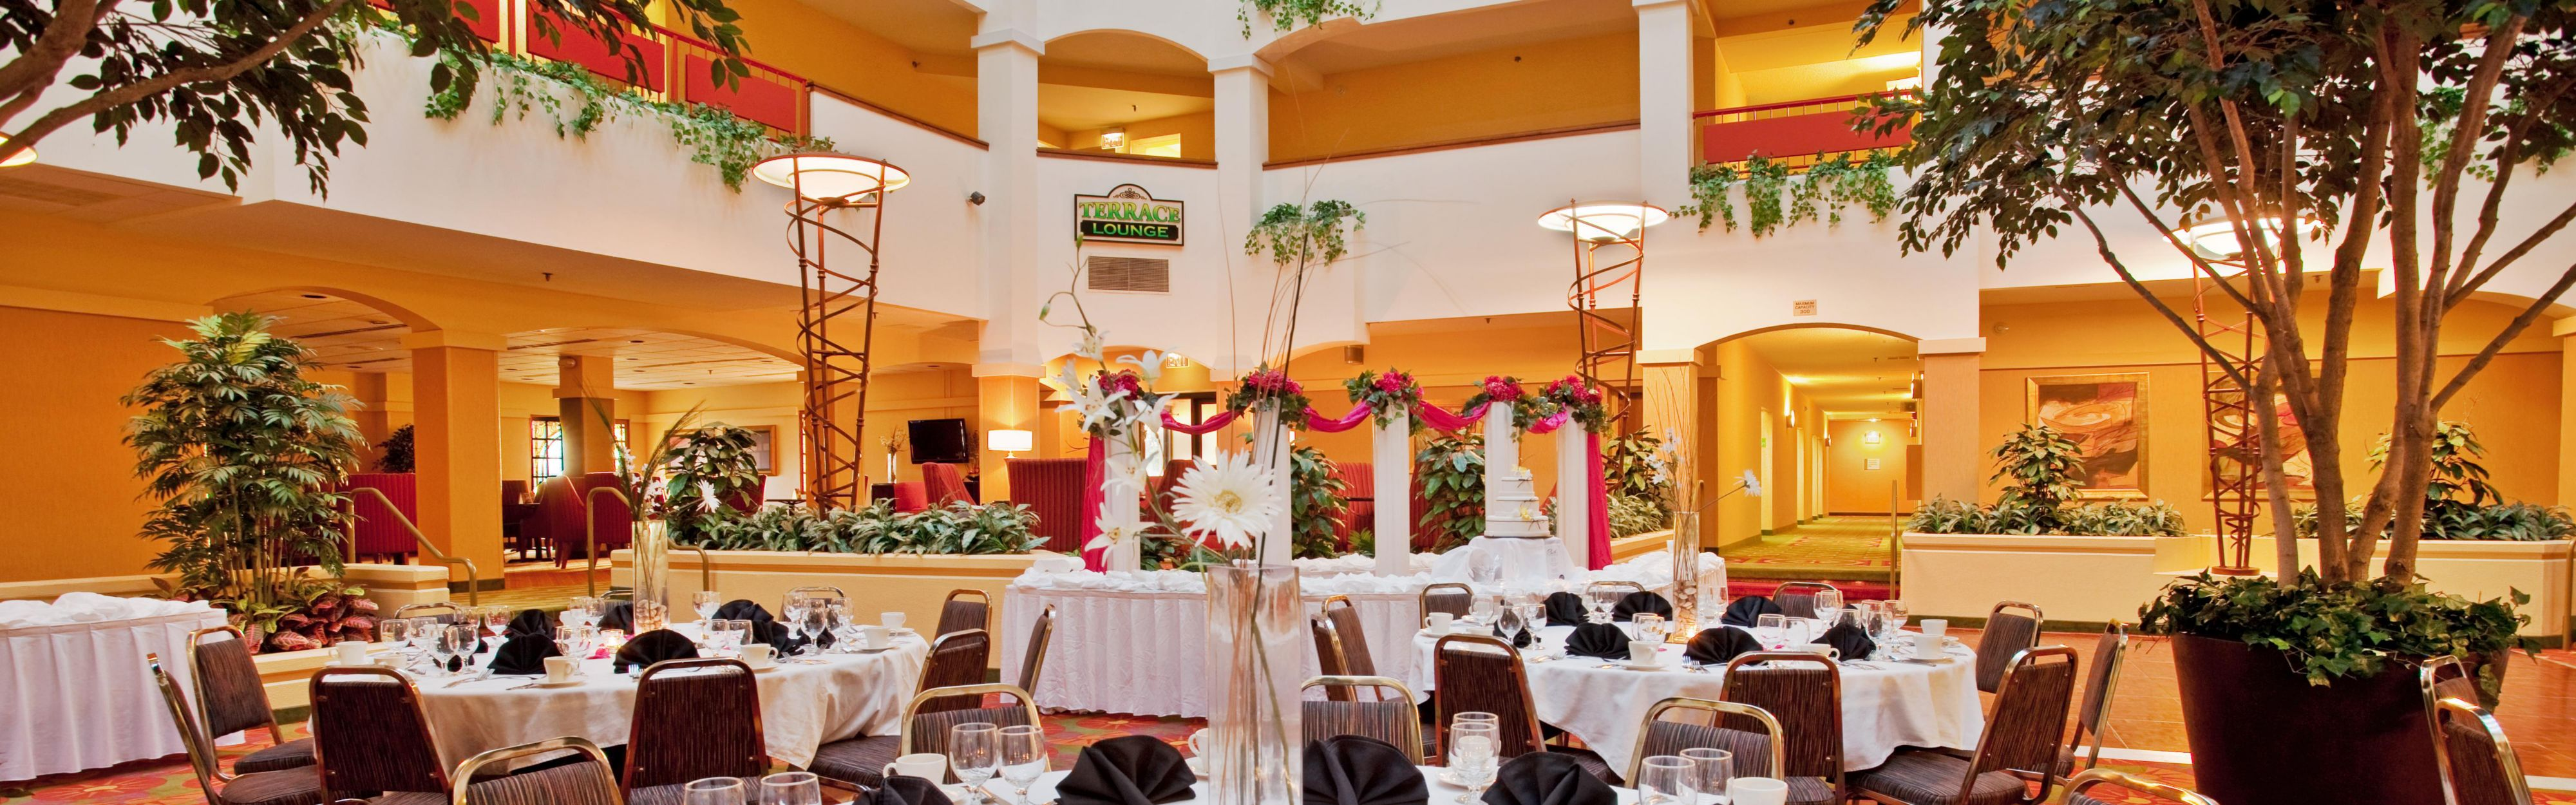 wedding reception crowne plazspringfield il%0A Holiday Inn Hotel  u     Suites Springfield  I